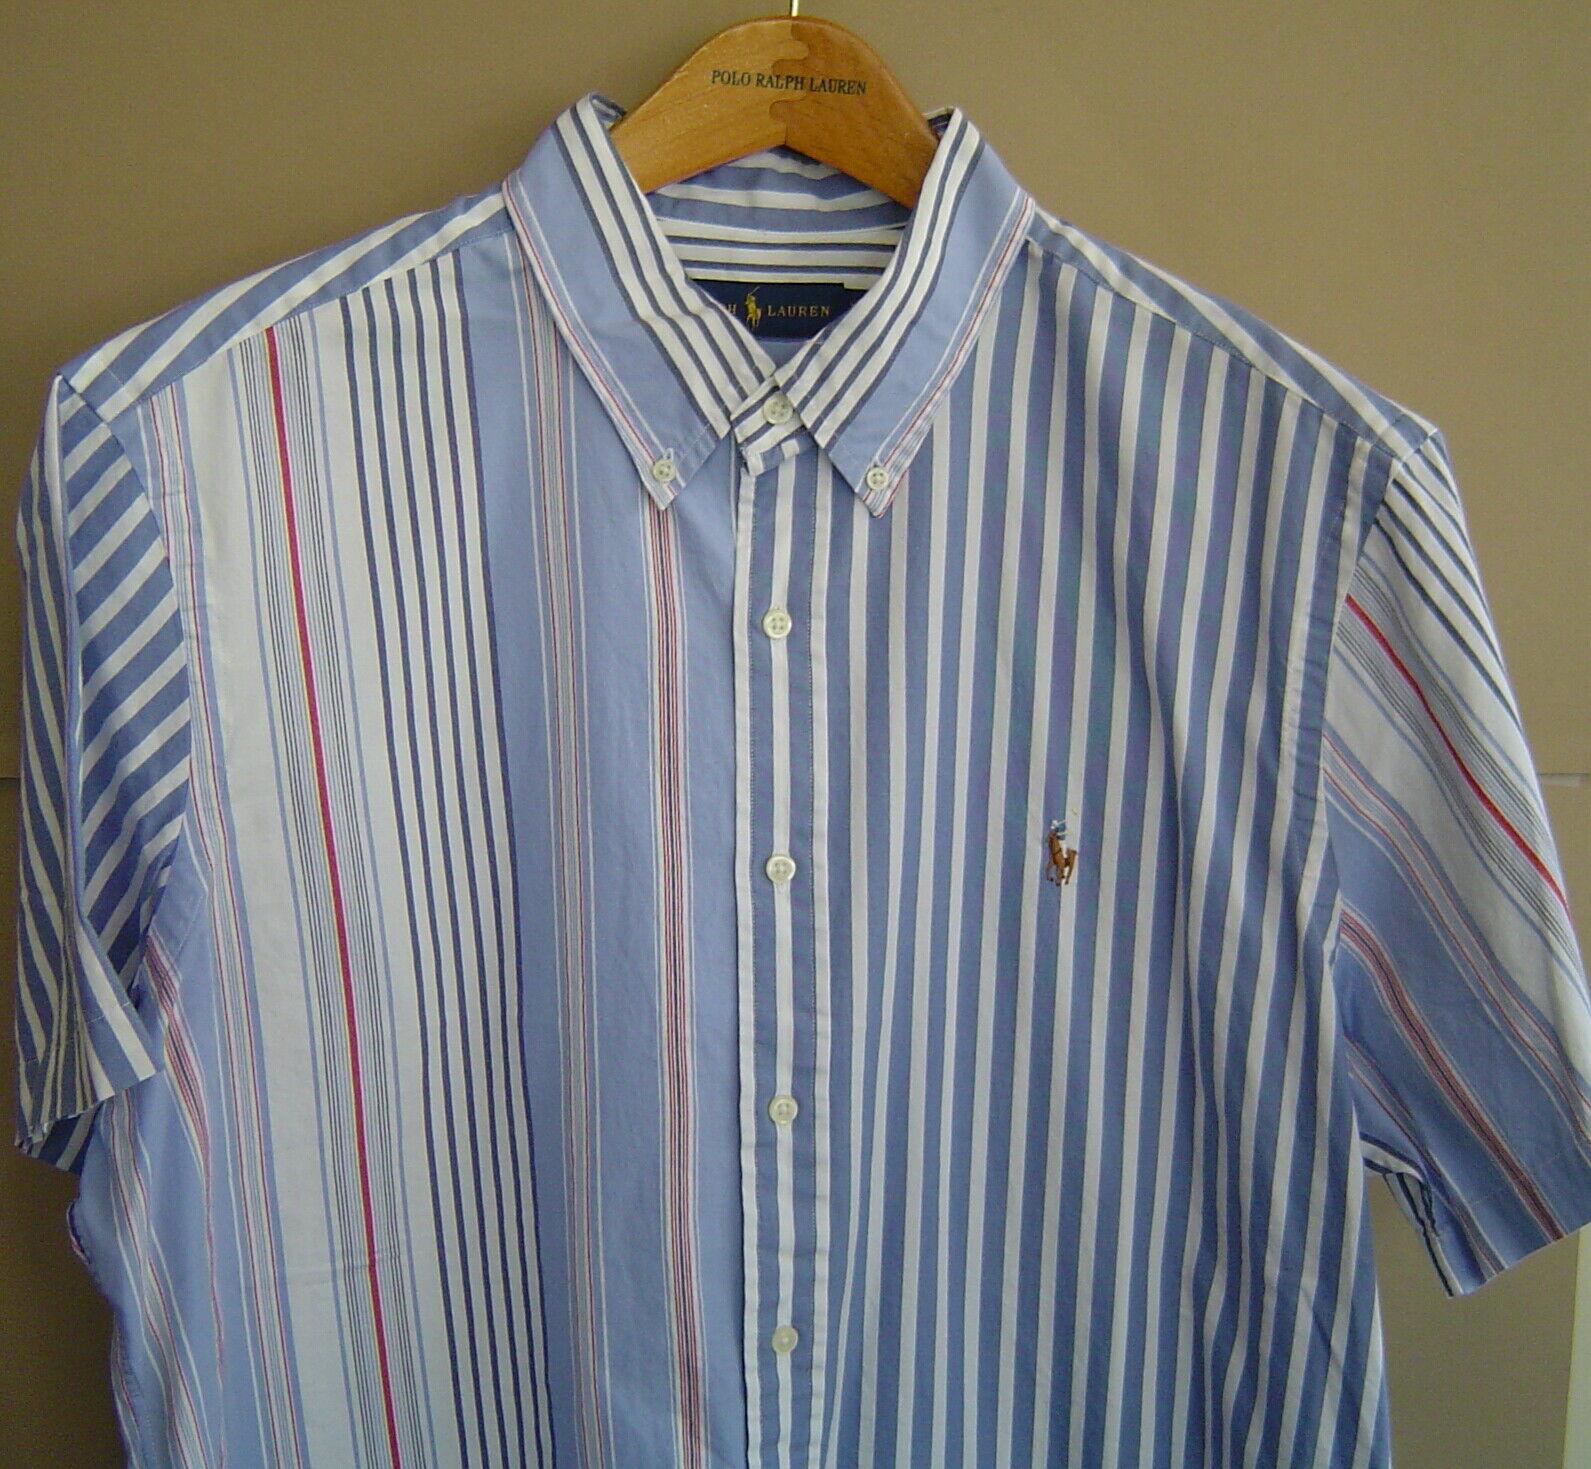 NWT  RALPH LAUREN Mens XL CLASSIC FIT STRIPE OXFORD COTTON SHIRT bluee White